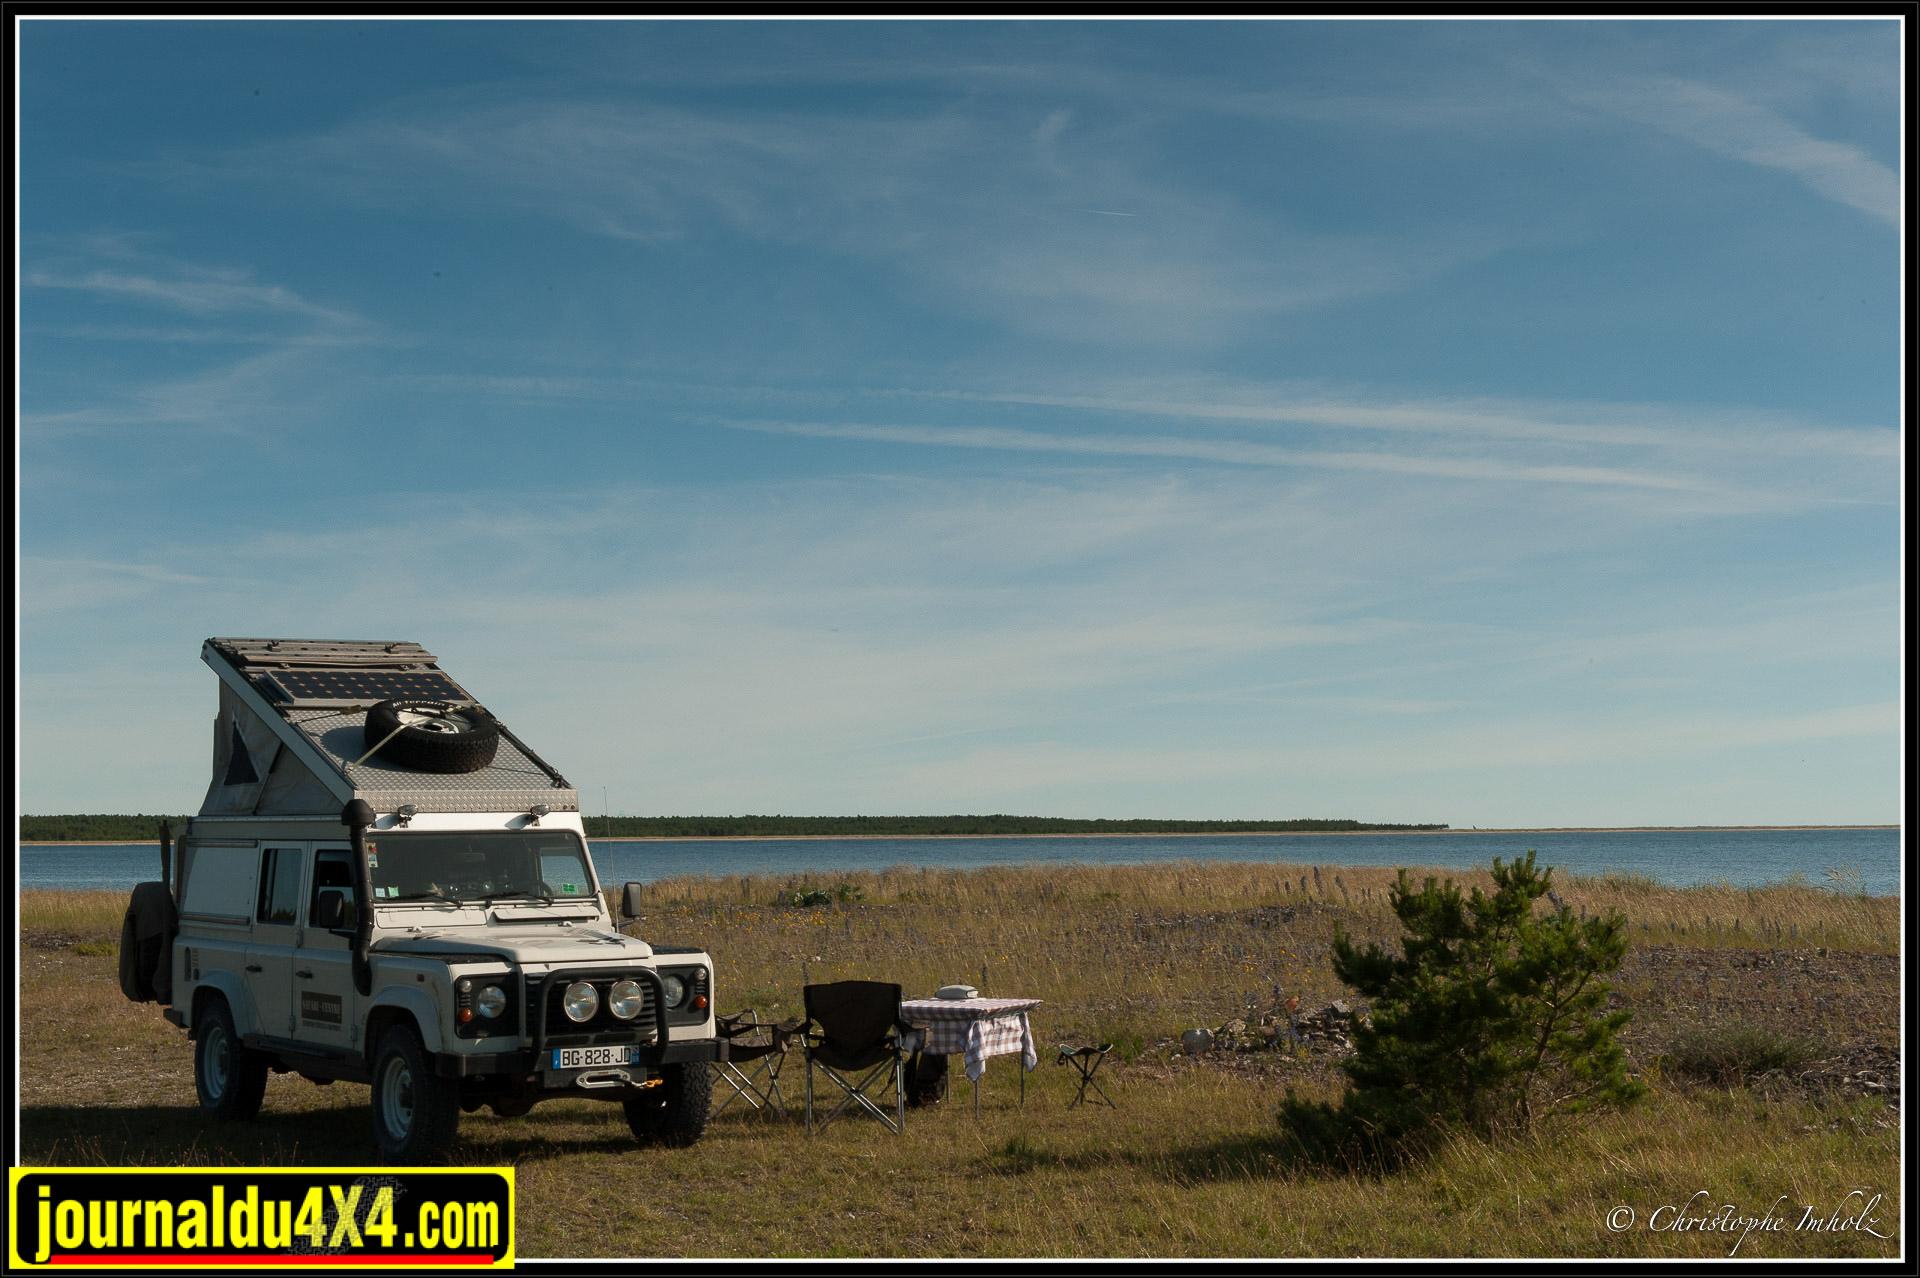 Estonie en 4×4, road trip de 15 jours